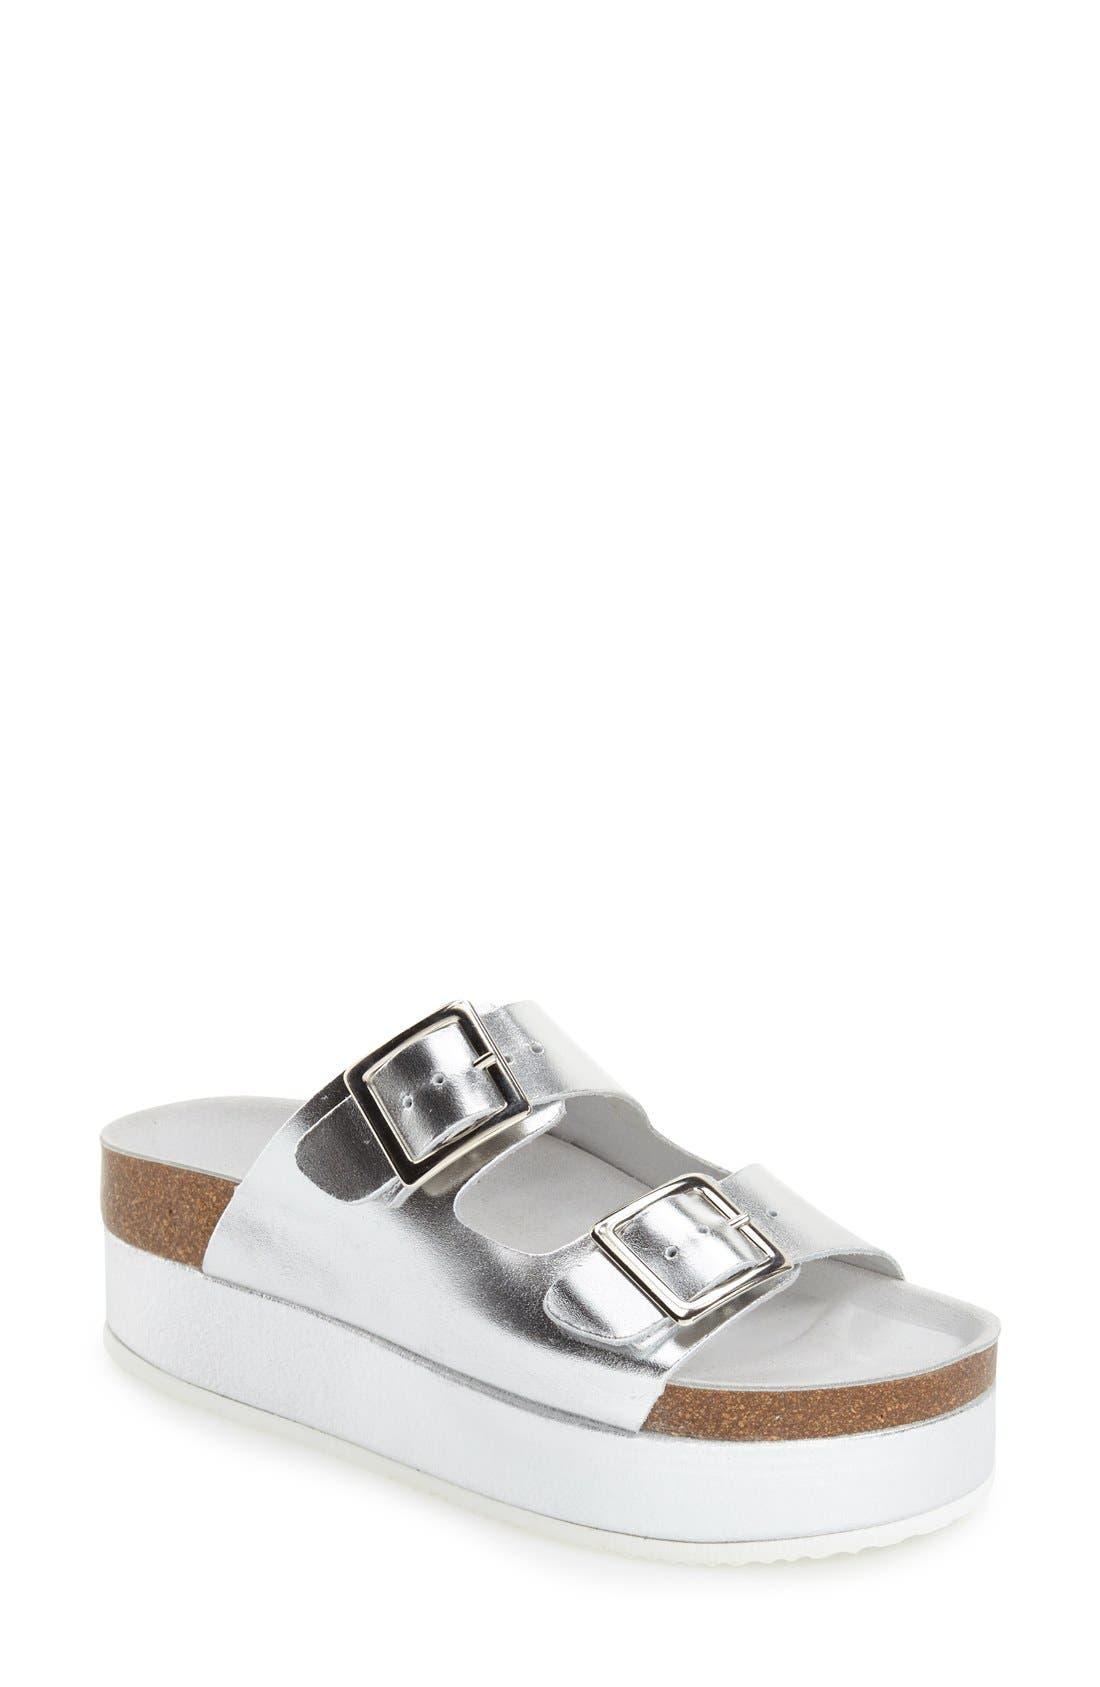 'Fang' Platform Sandal,                         Main,                         color, Silver Multi